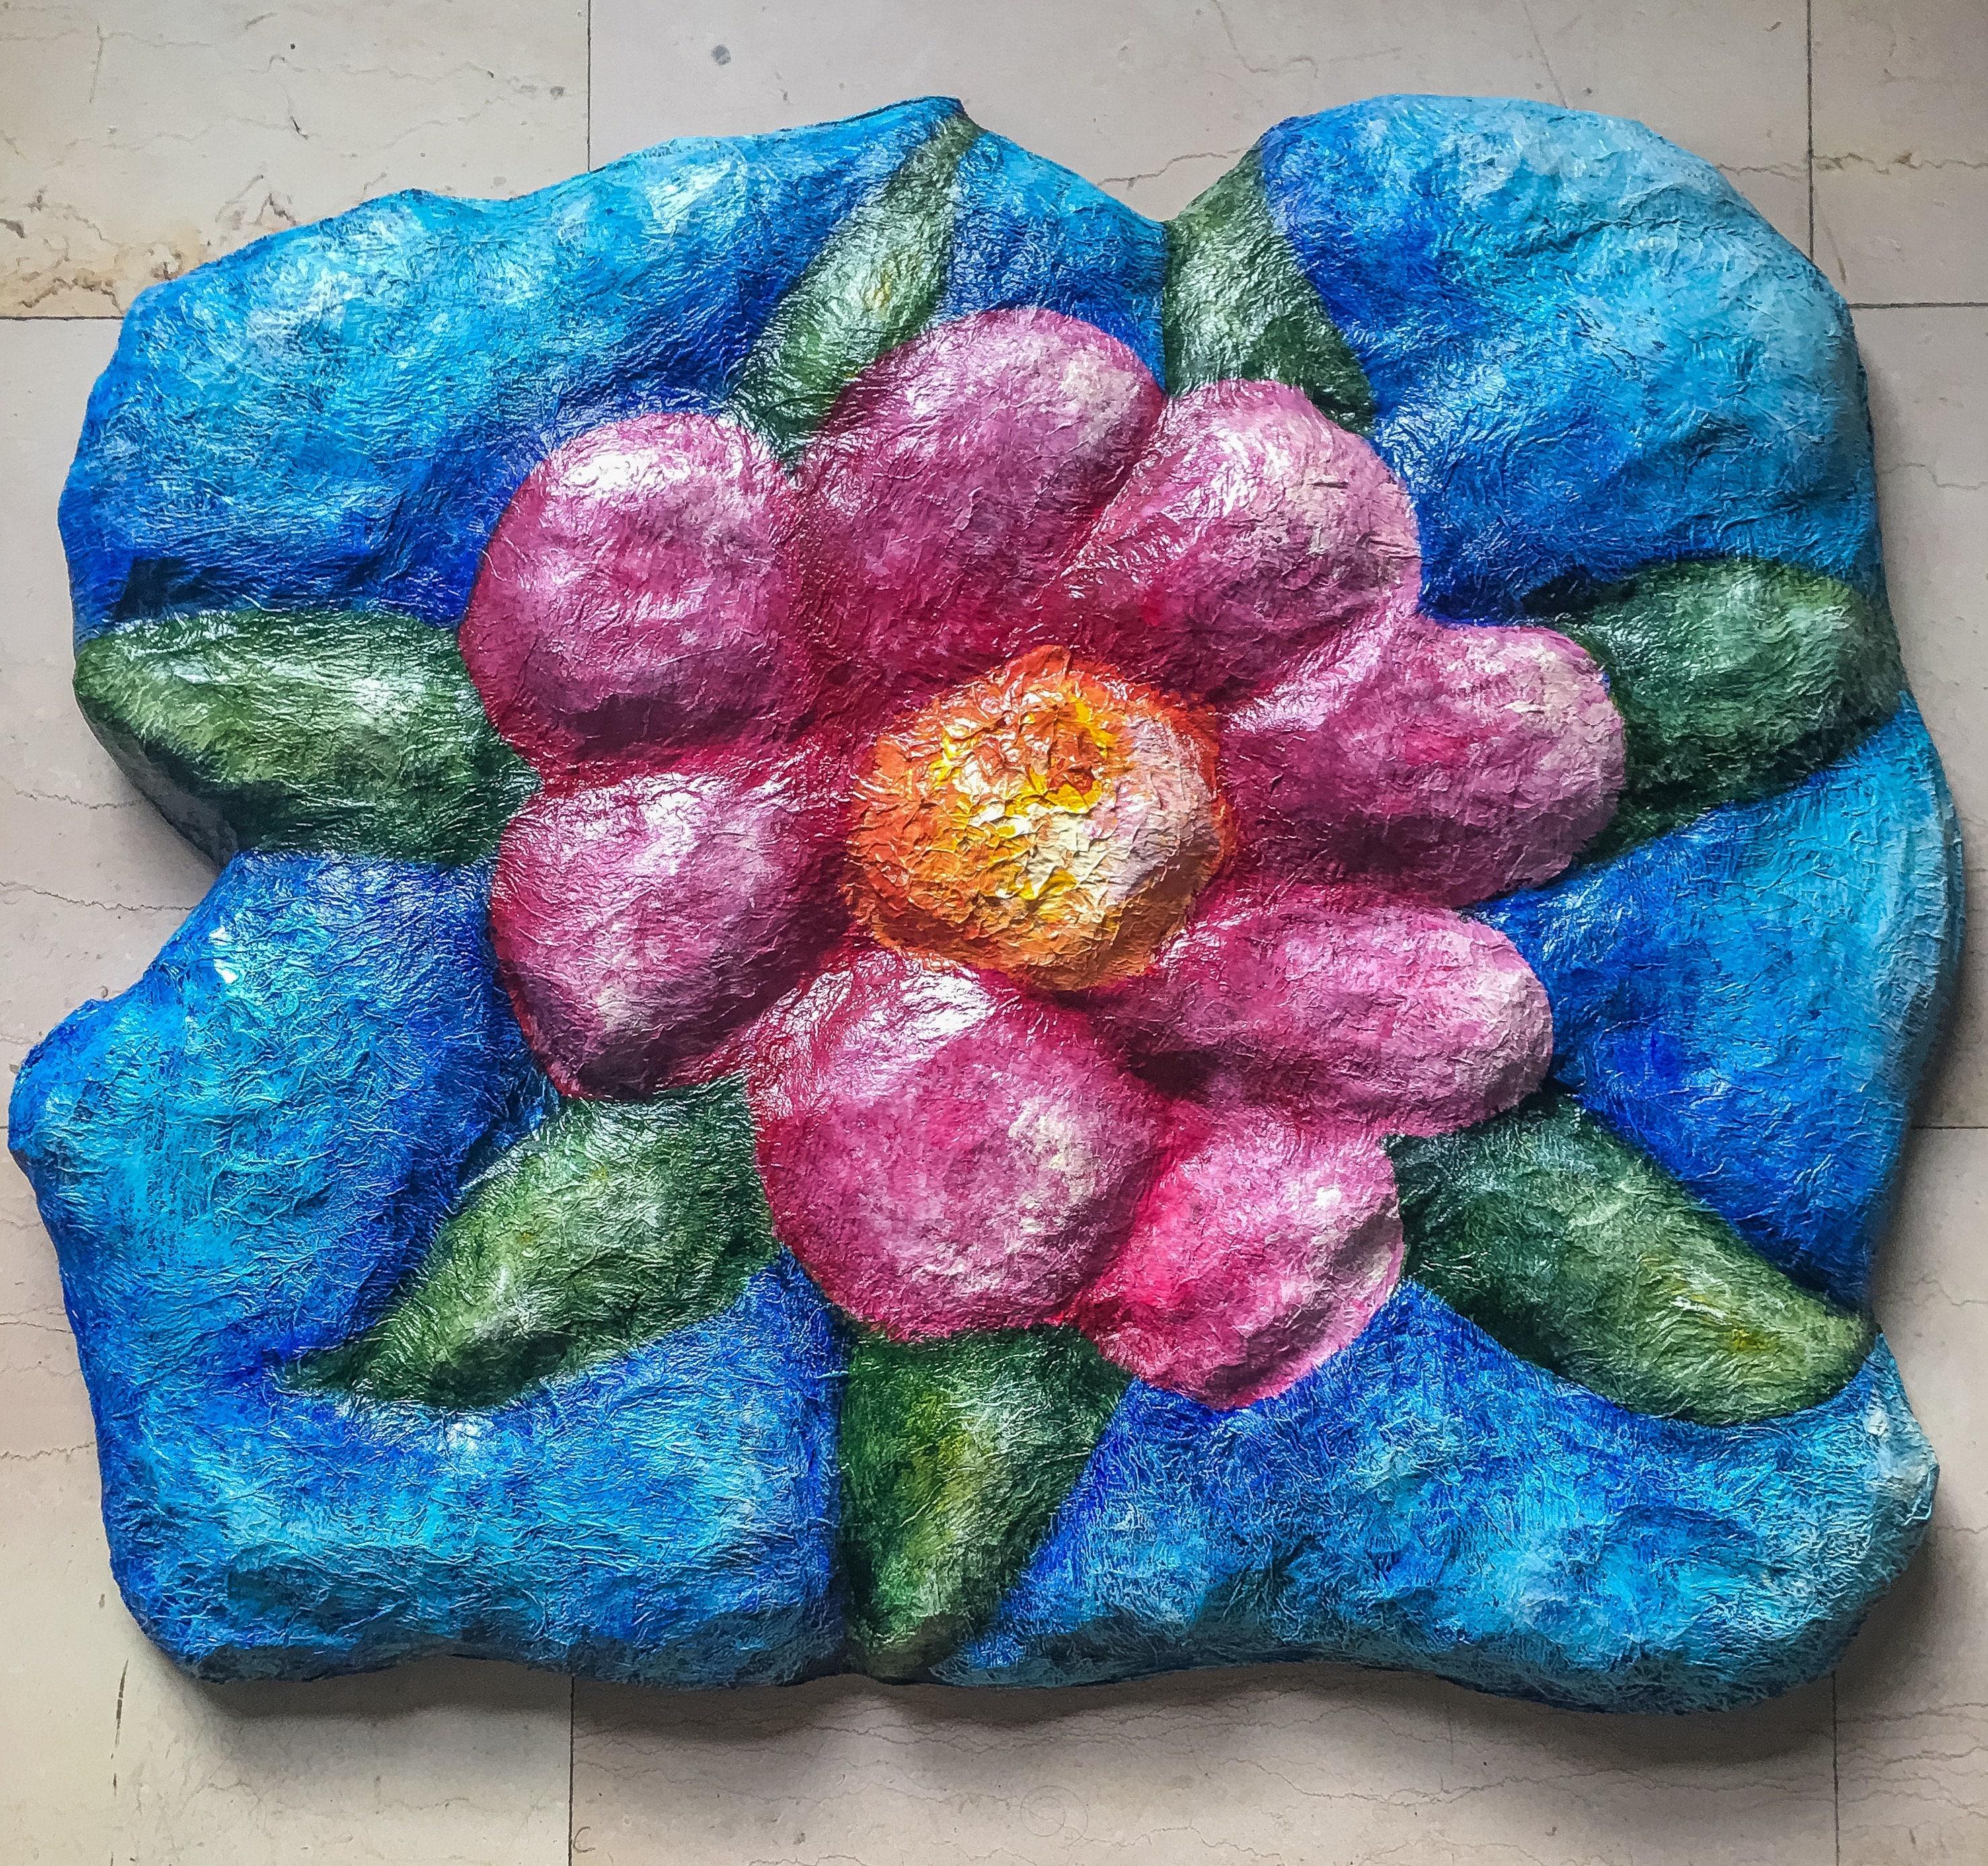 Big Flower Paper Mache Sculpture E1023101840998359m 4399